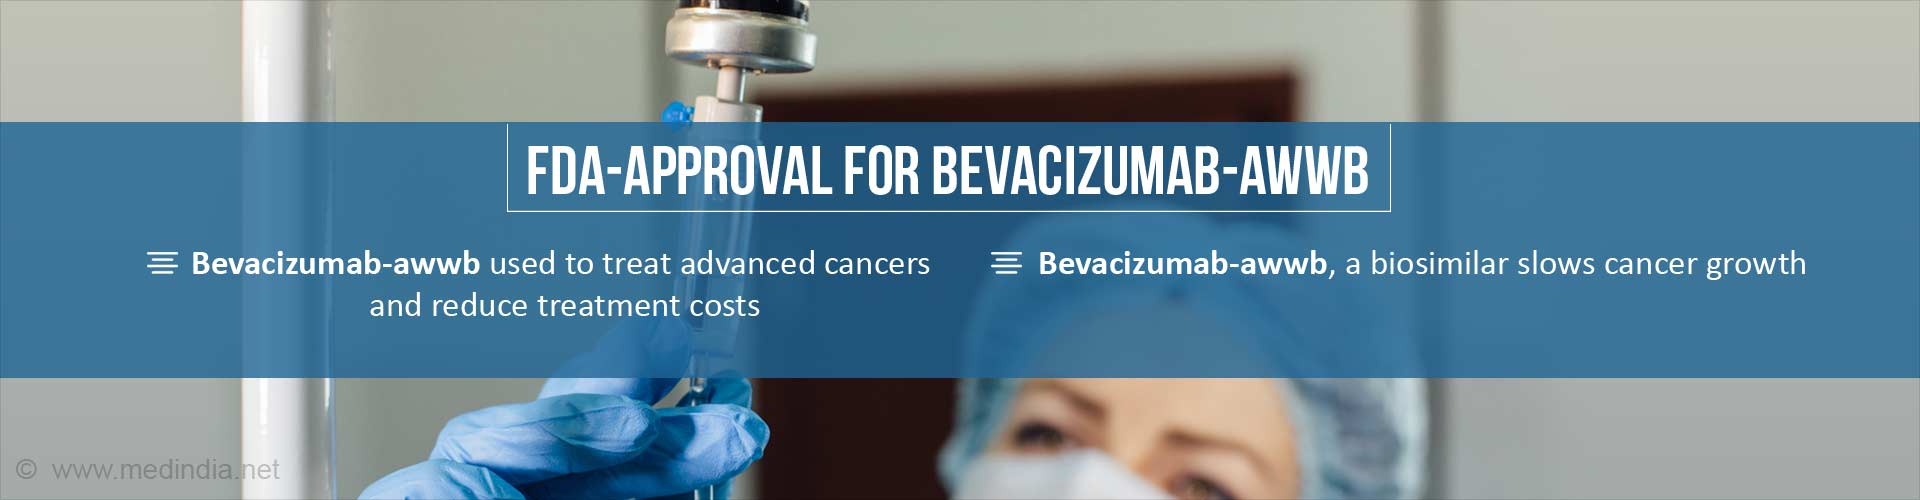 FDA-Approval for Bevacizumab-awwb for Treatment of Advanced Cancers